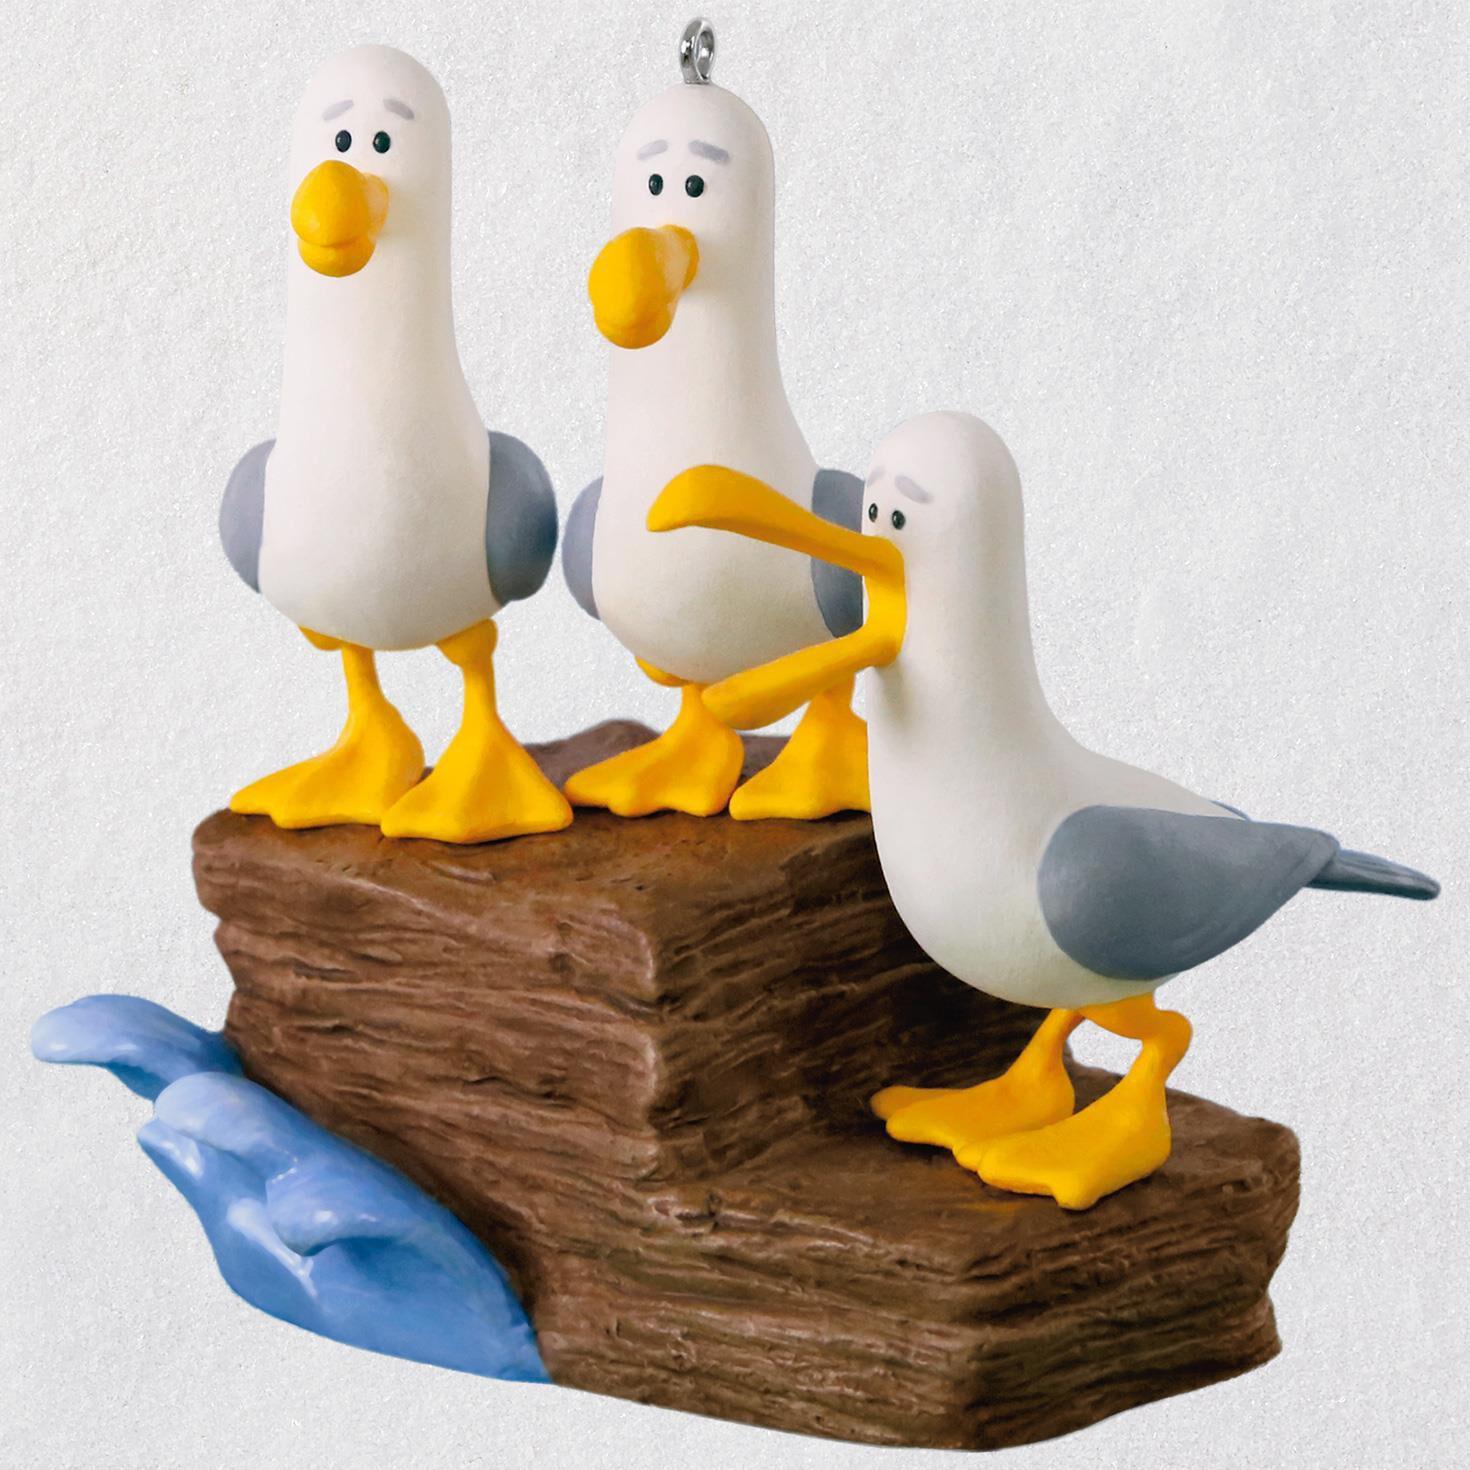 disney pixar finding nemo mine mine mine seagulls ornament with